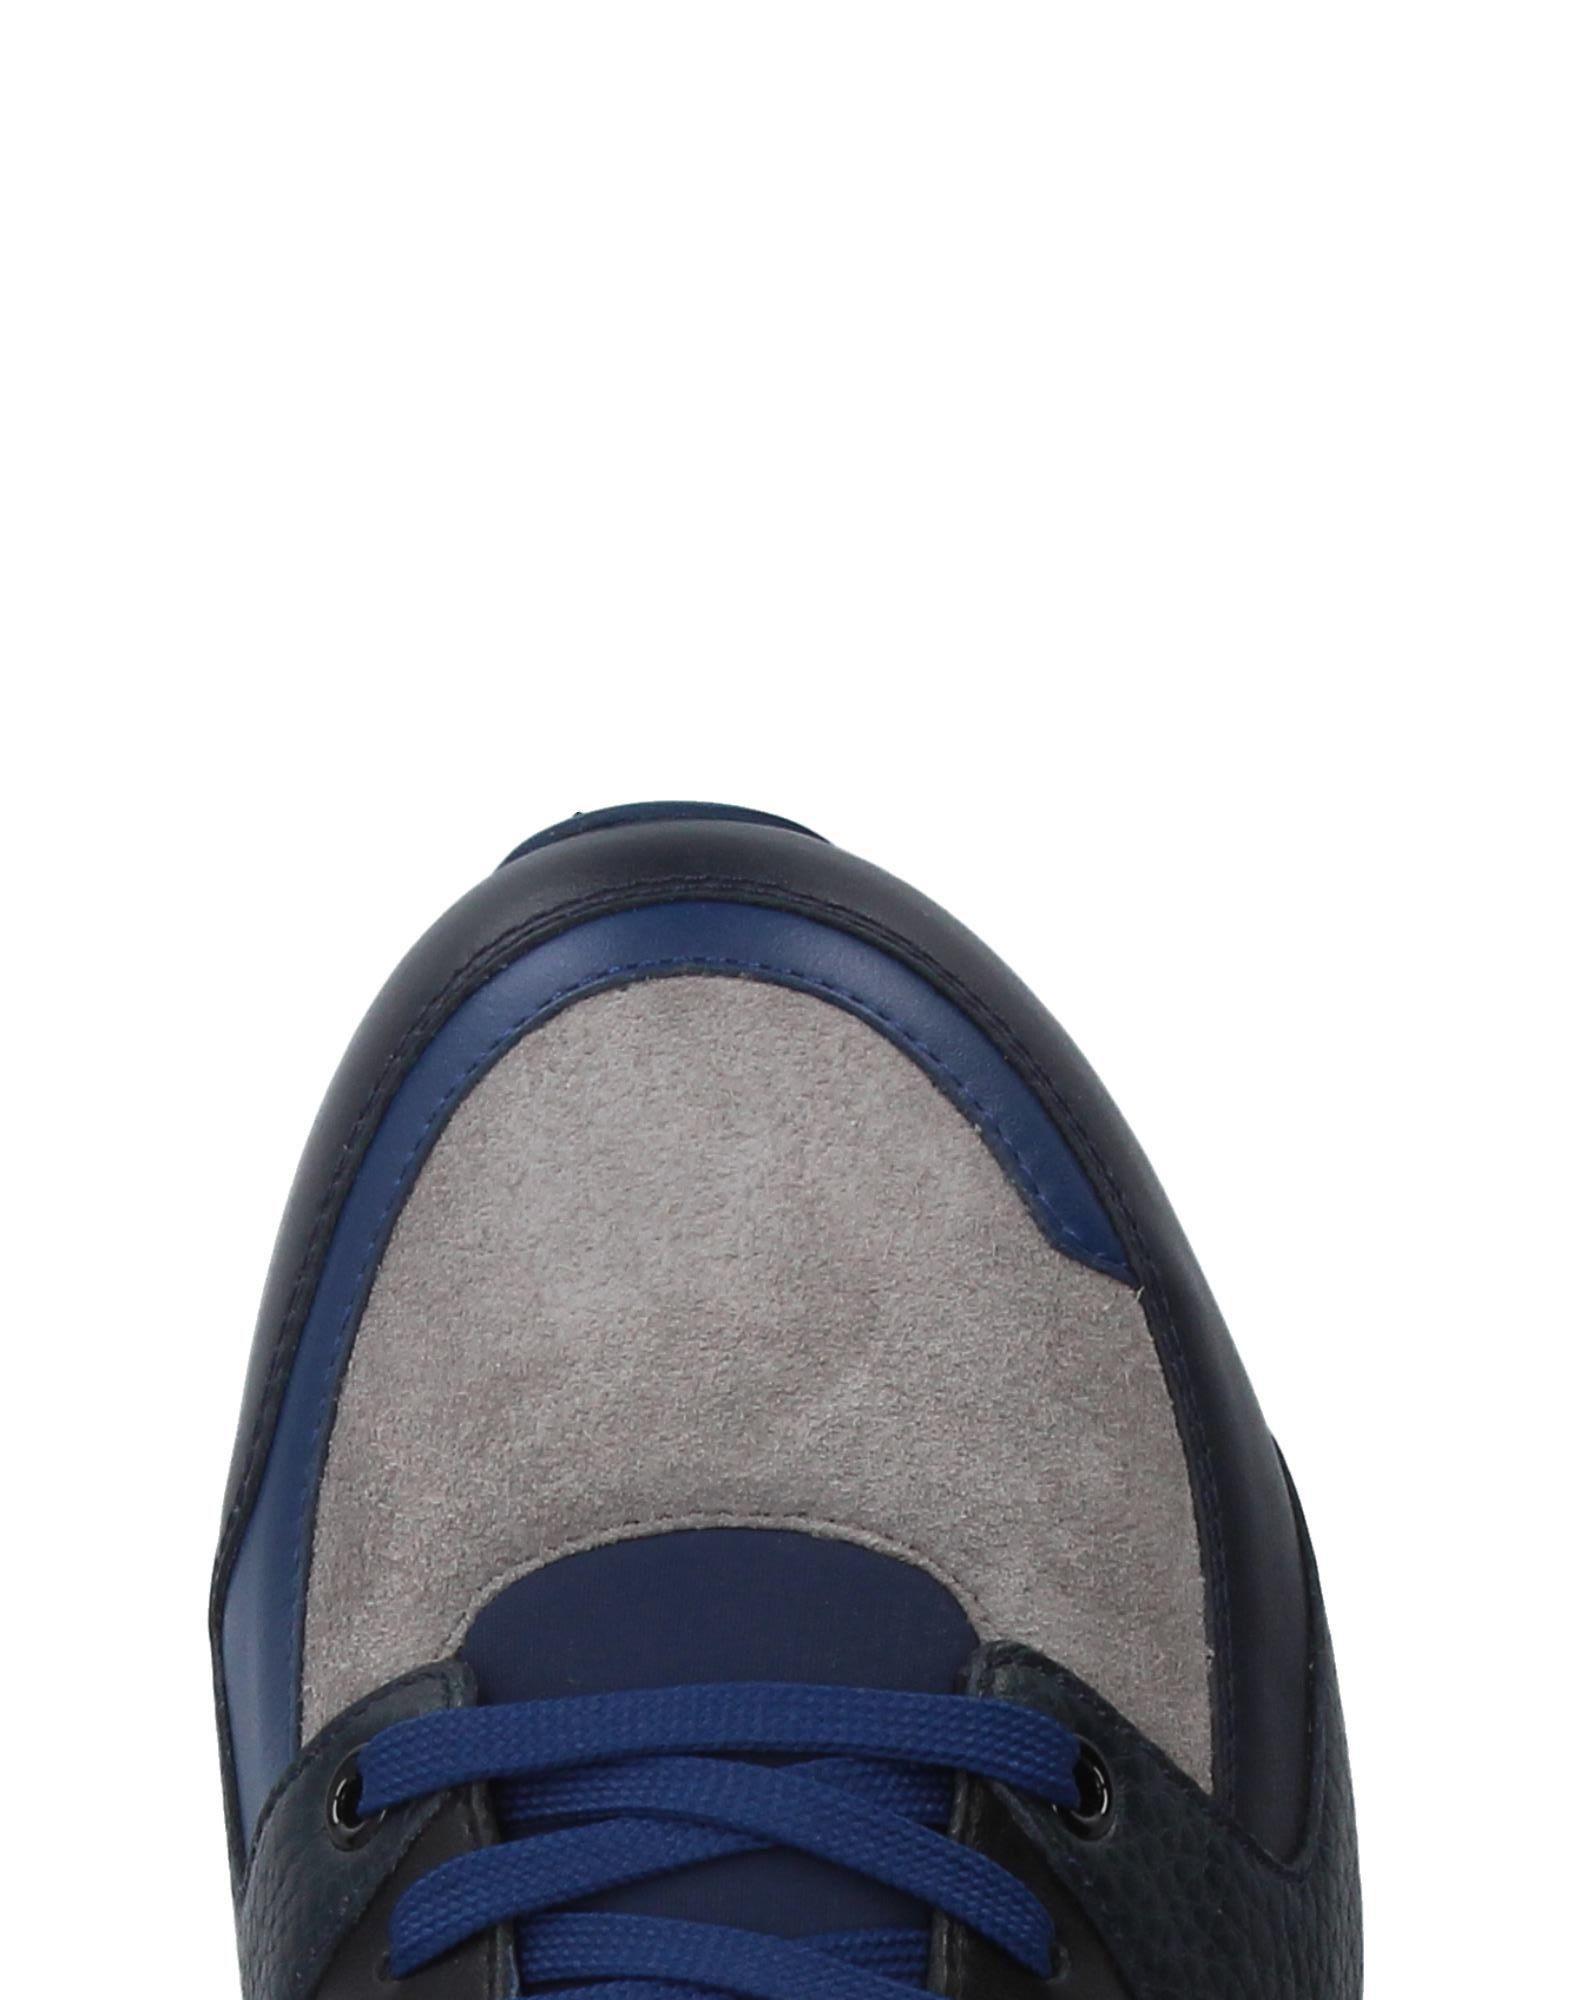 Dolce 11221032AM & Gabbana Sneakers Herren  11221032AM Dolce Gute Qualität beliebte Schuhe 5c4209